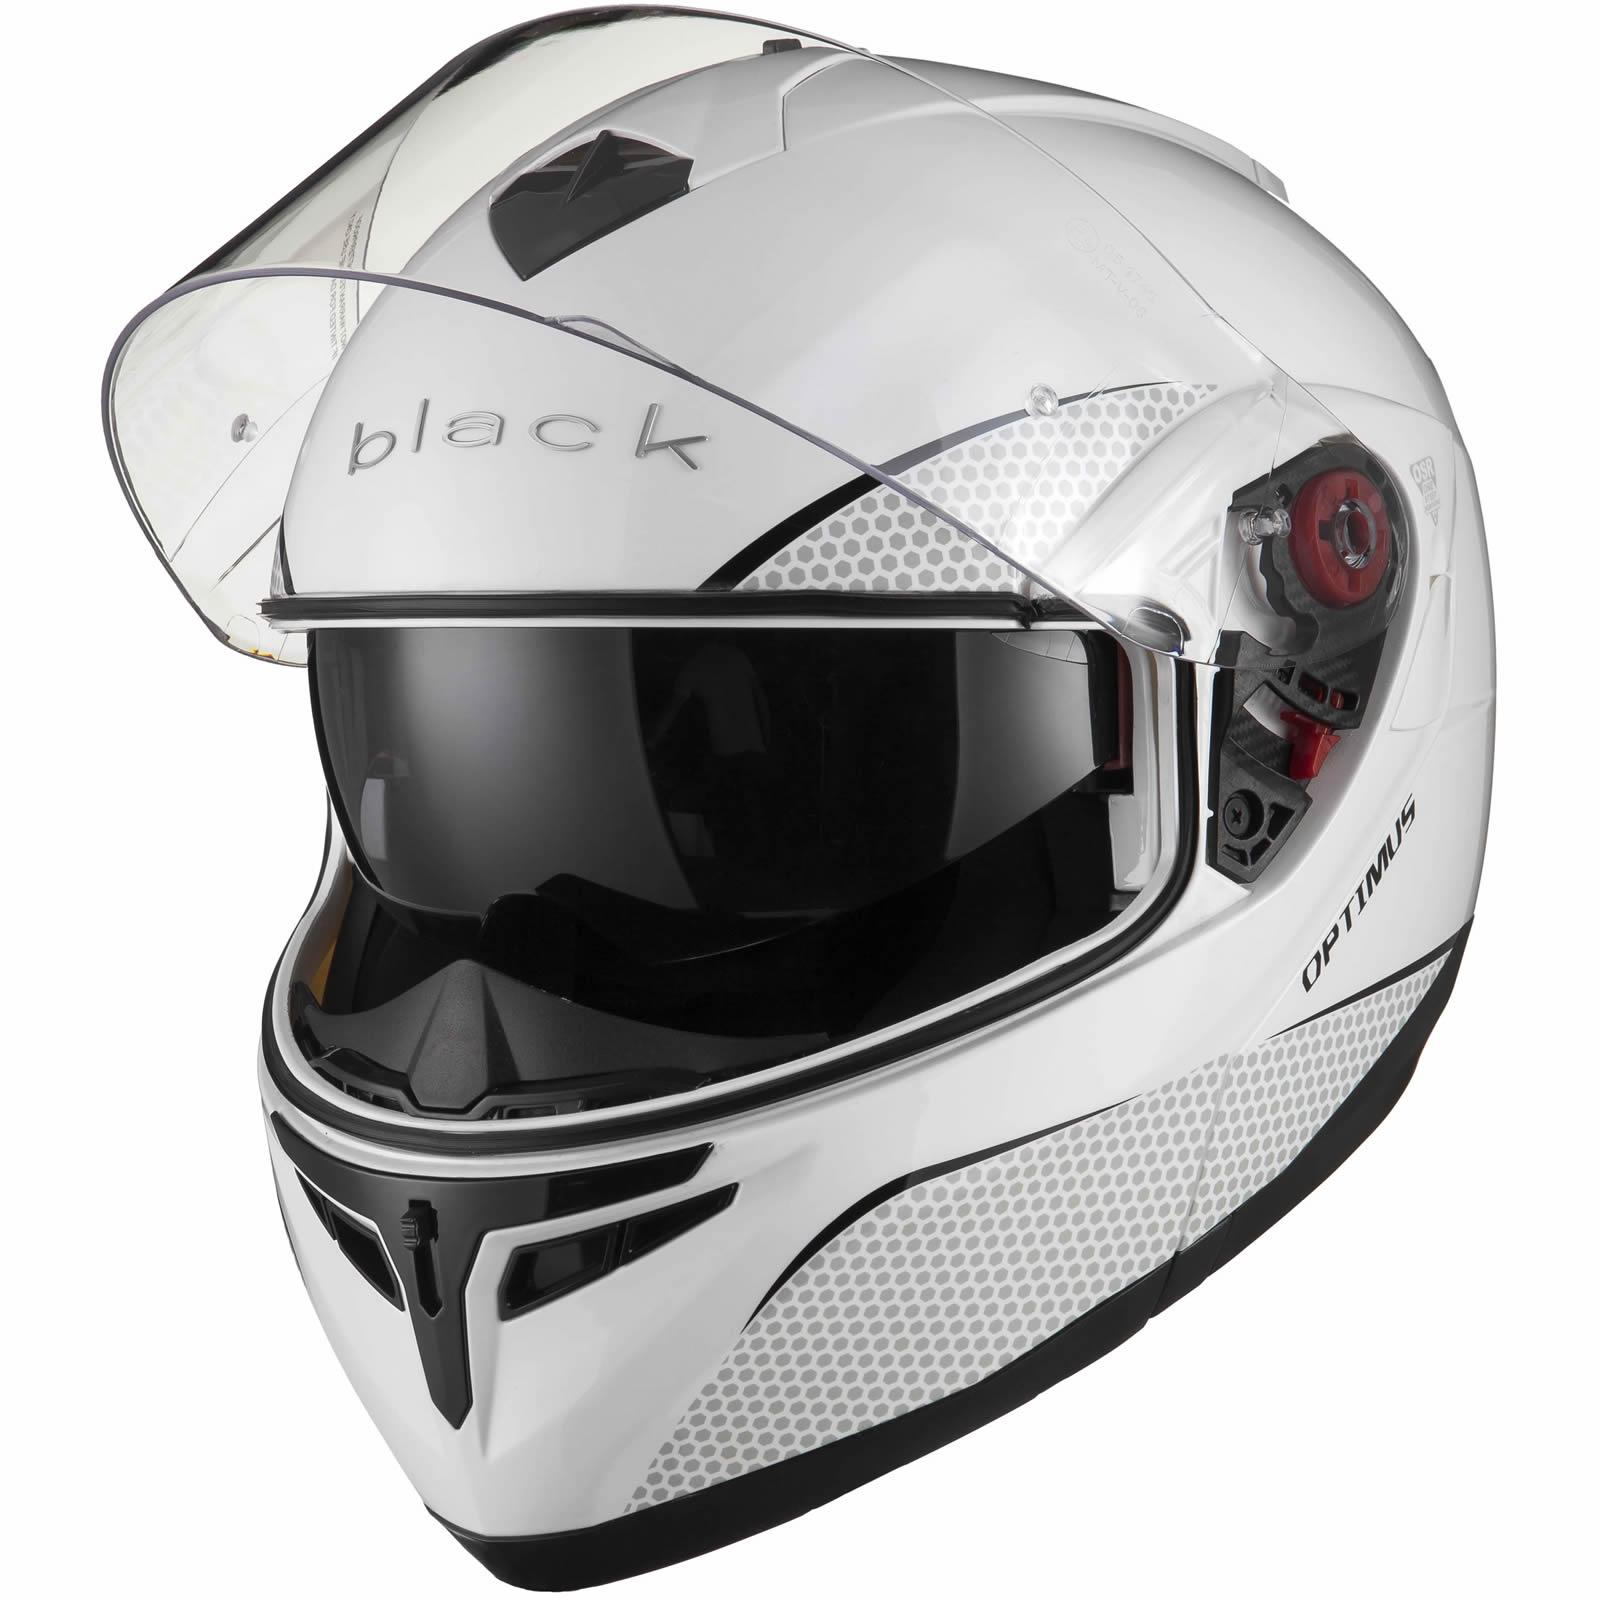 Black-Optimus-SV-Max-Vision-Flip-Up-Front-Motorcycle-Helmet-Pinlock-Ready-Visor thumbnail 26